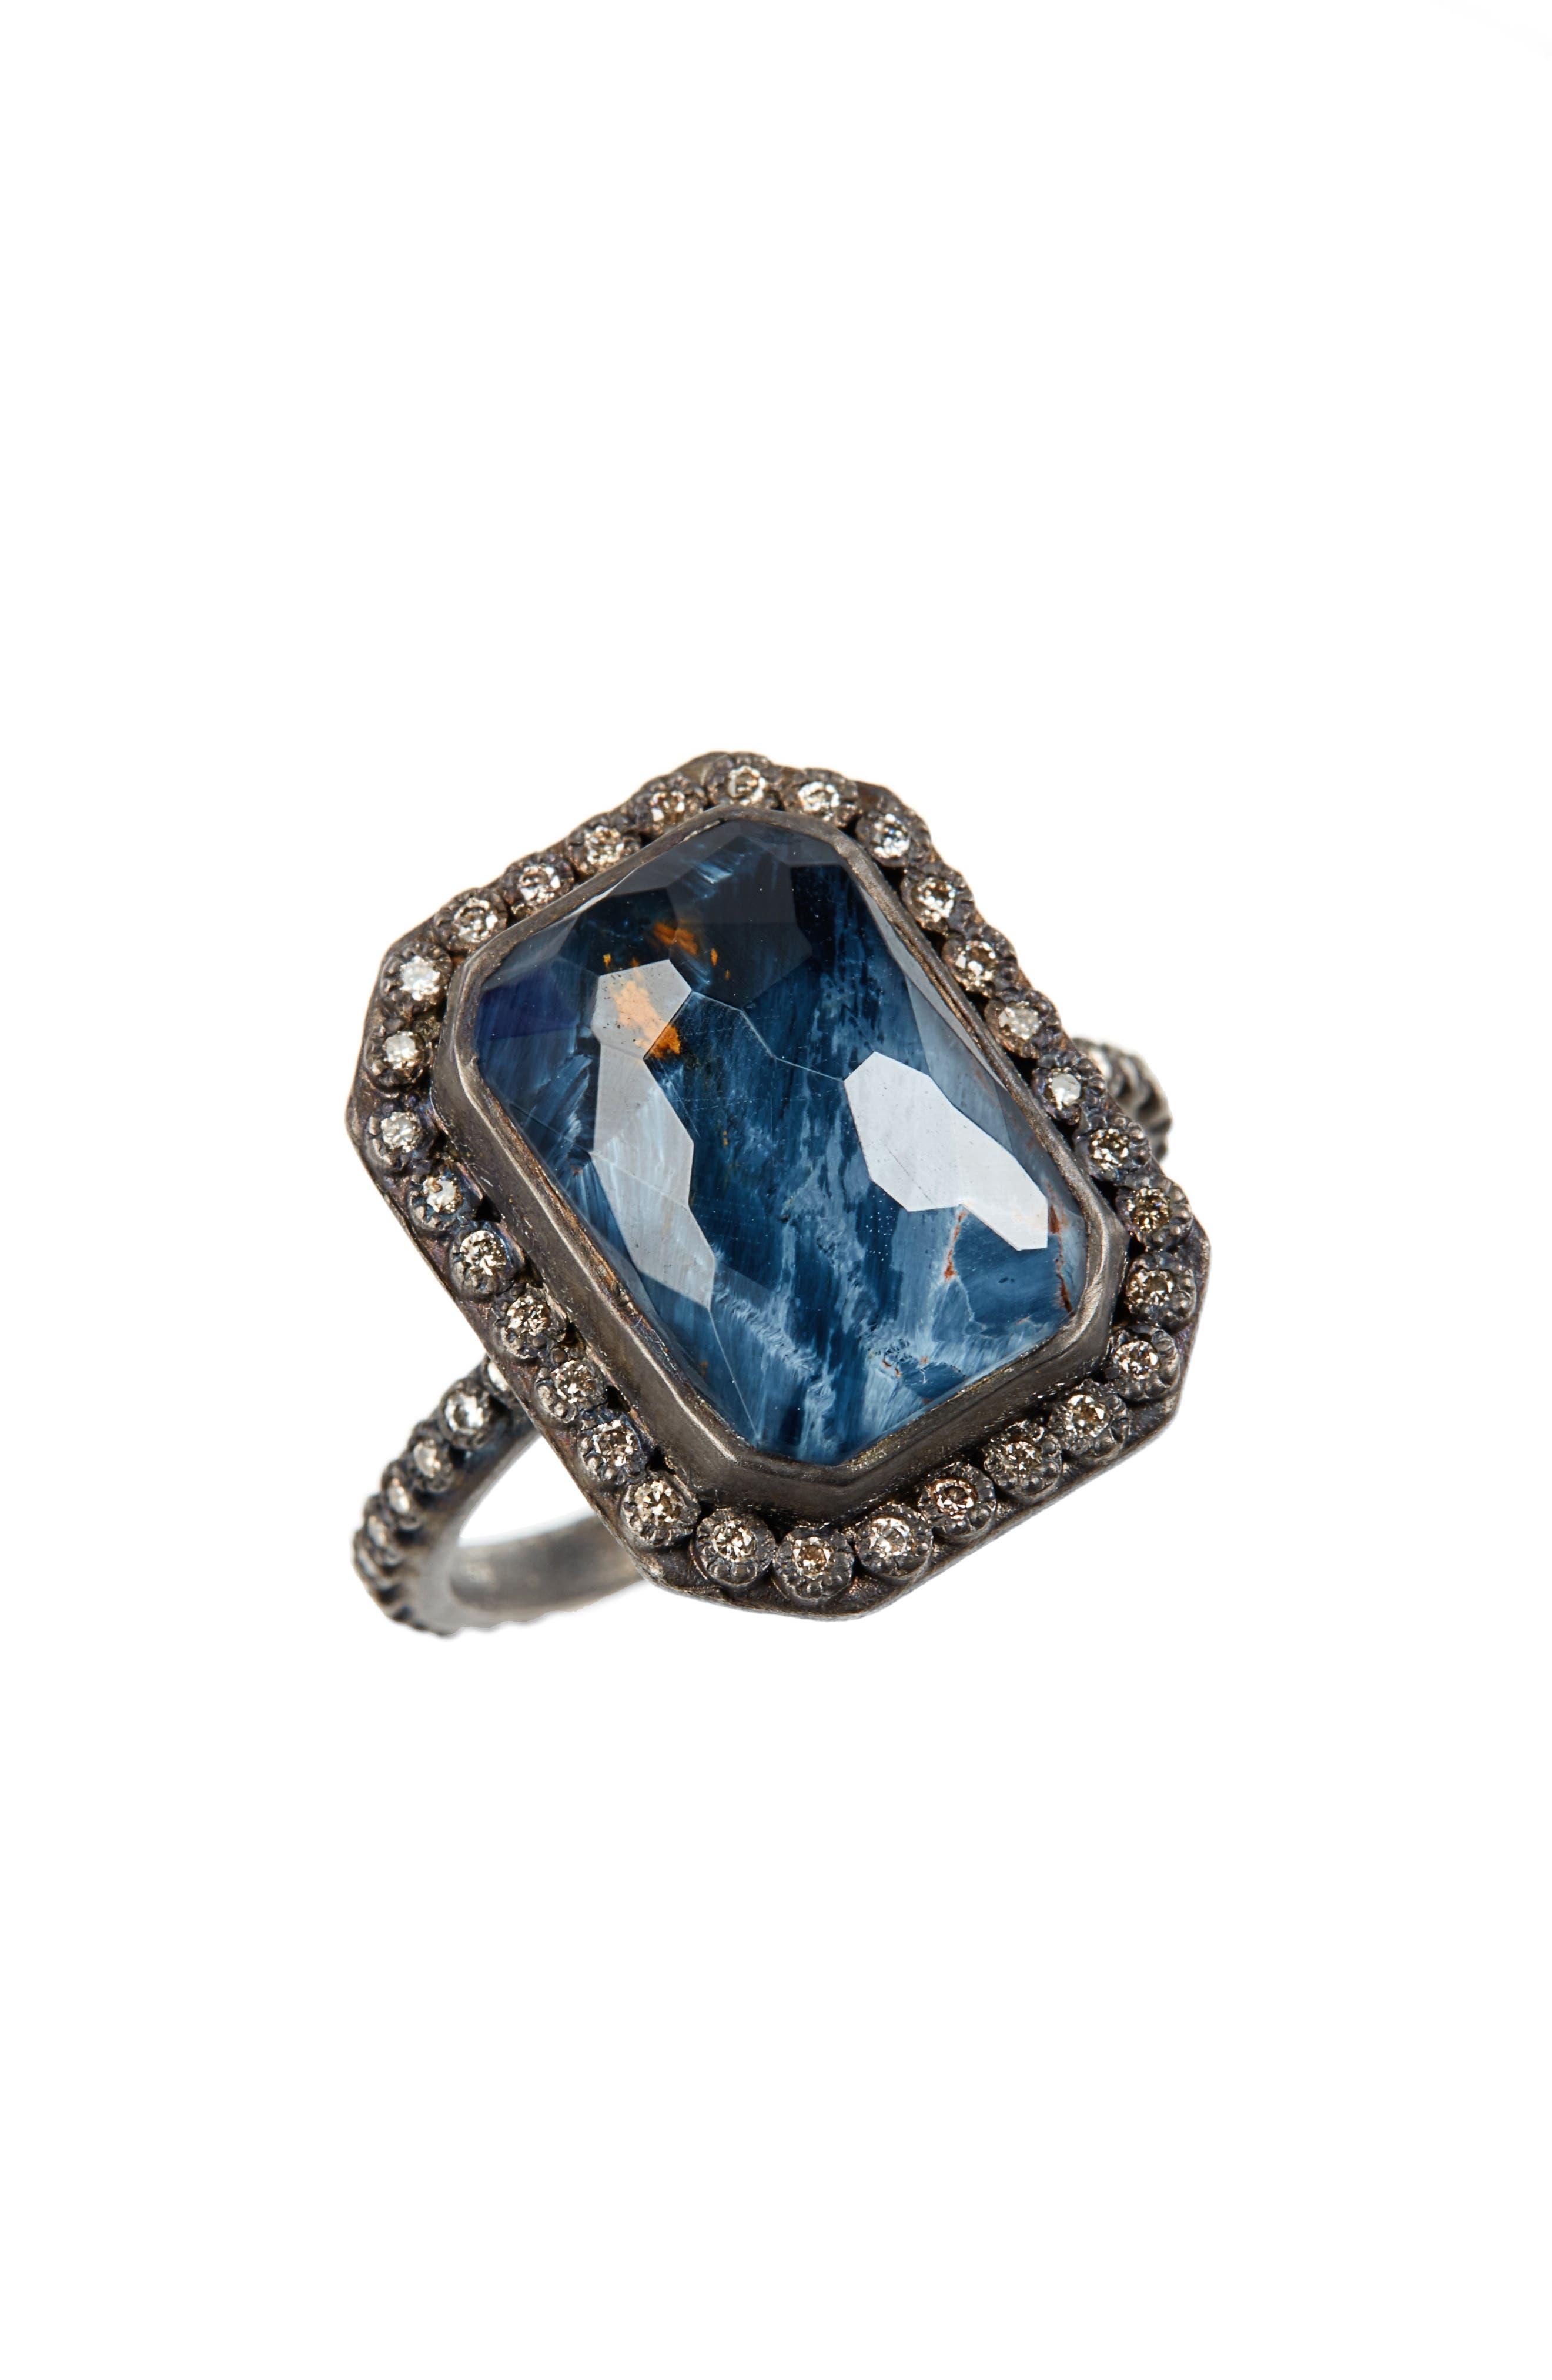 Old World Midnight Emerald-Cut Quartz & Diamond Ring,                         Main,                         color, SILVER